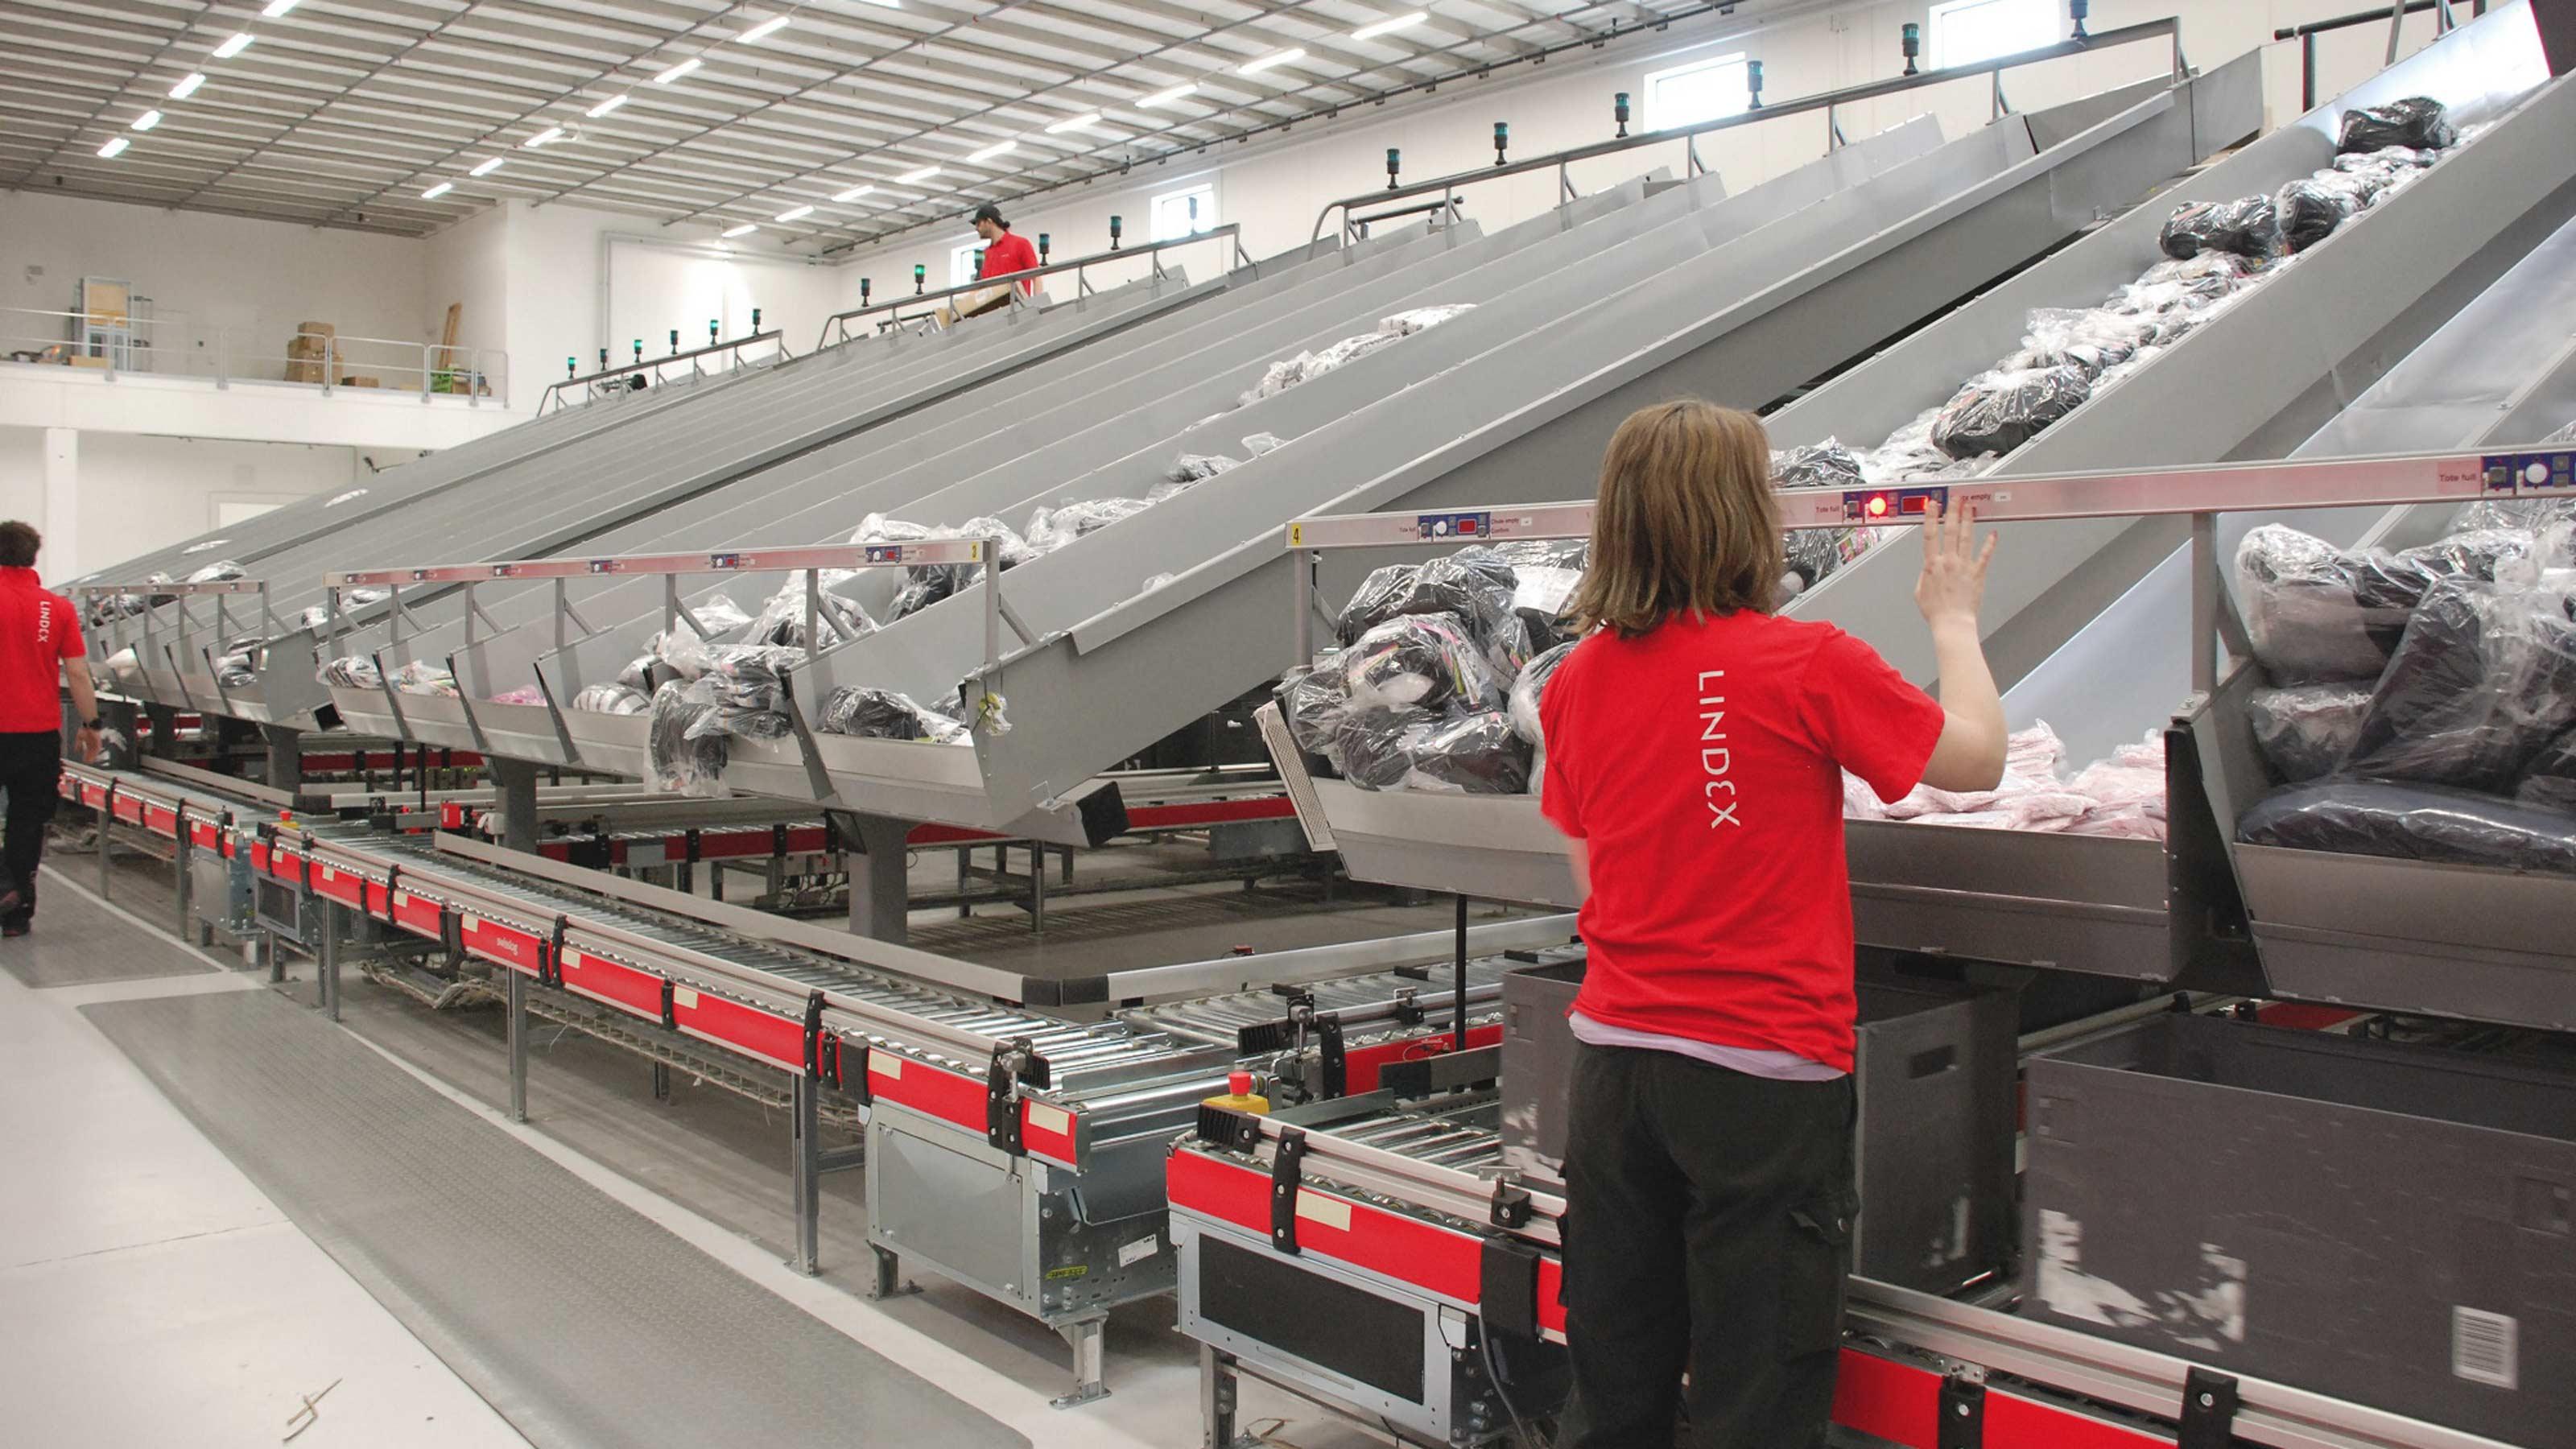 Lindex Fashion Retailer Automated Logistics Swisslog